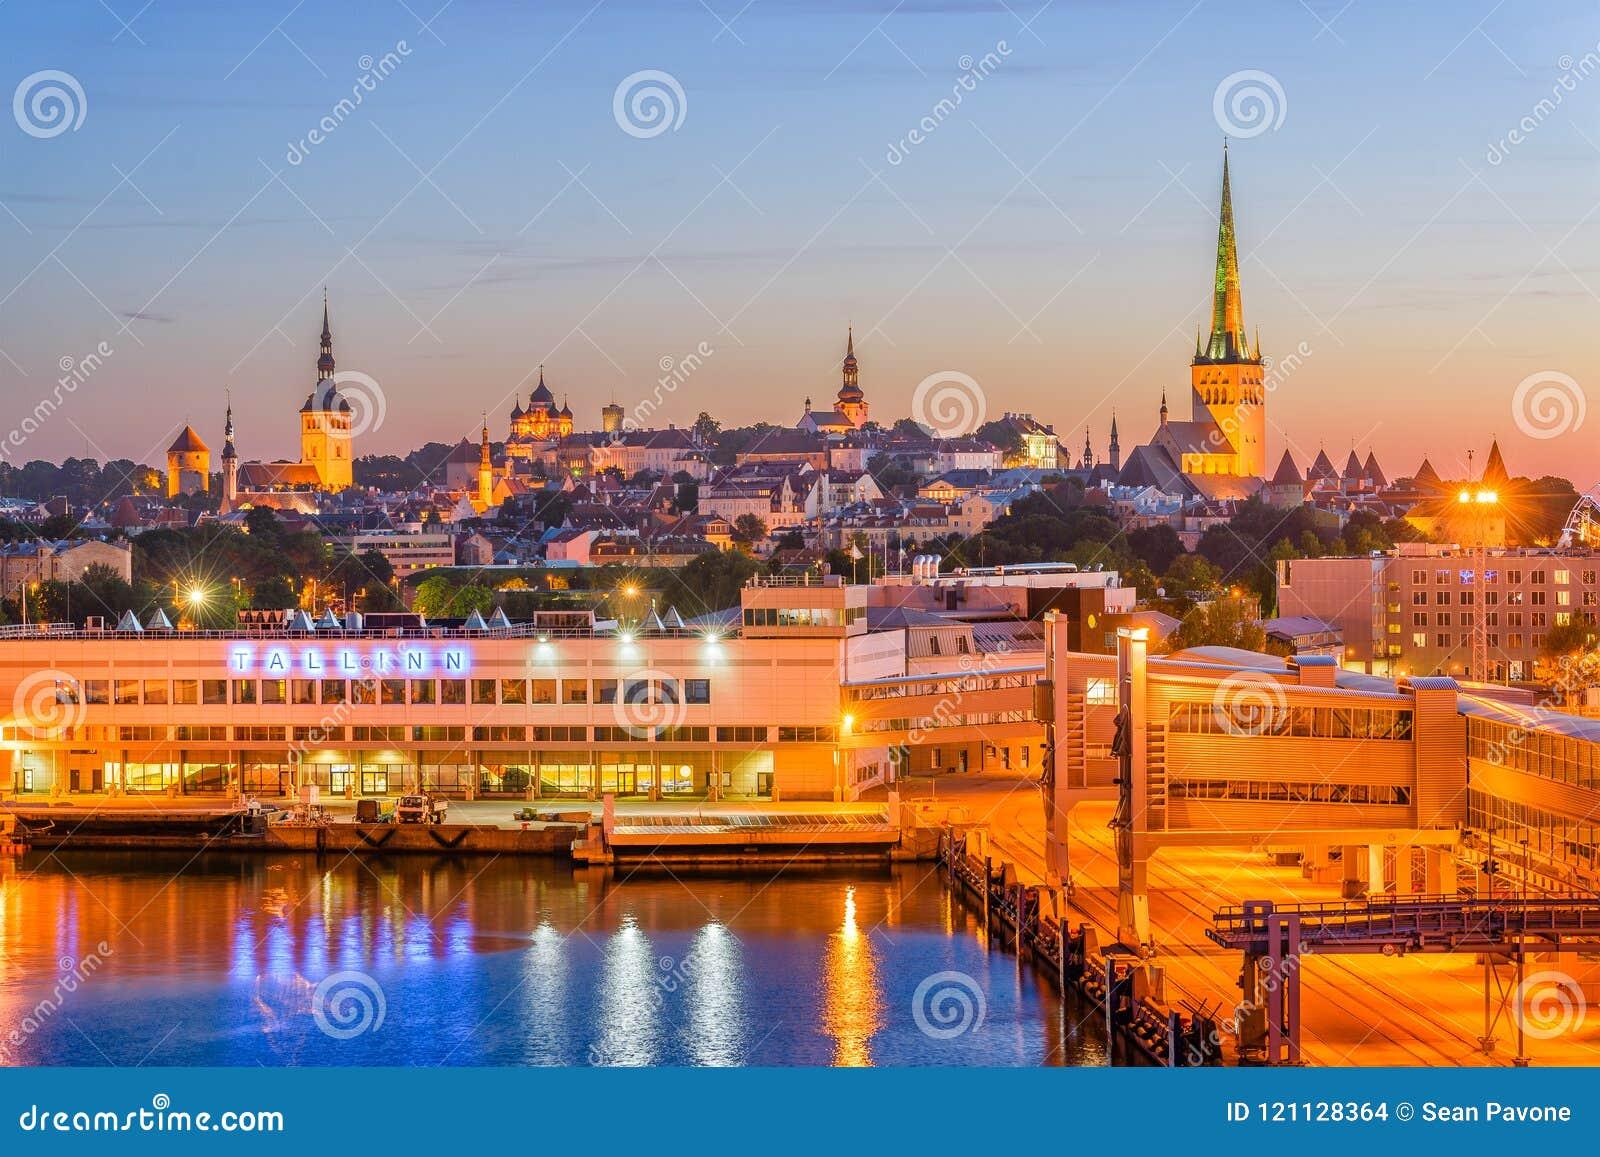 Embarcadero de Tallinn, Estonia